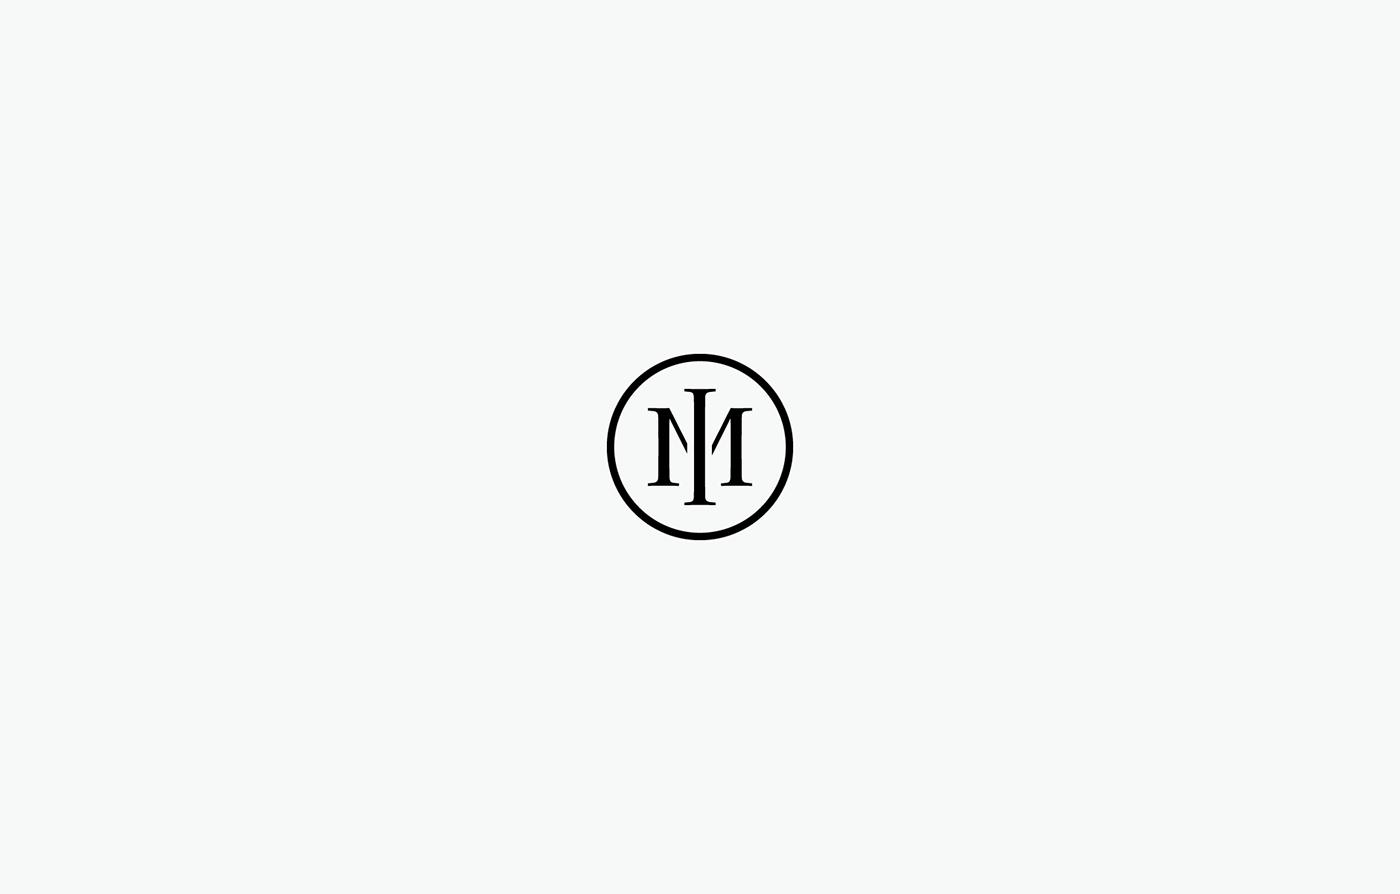 Logotype logo symbols monogram